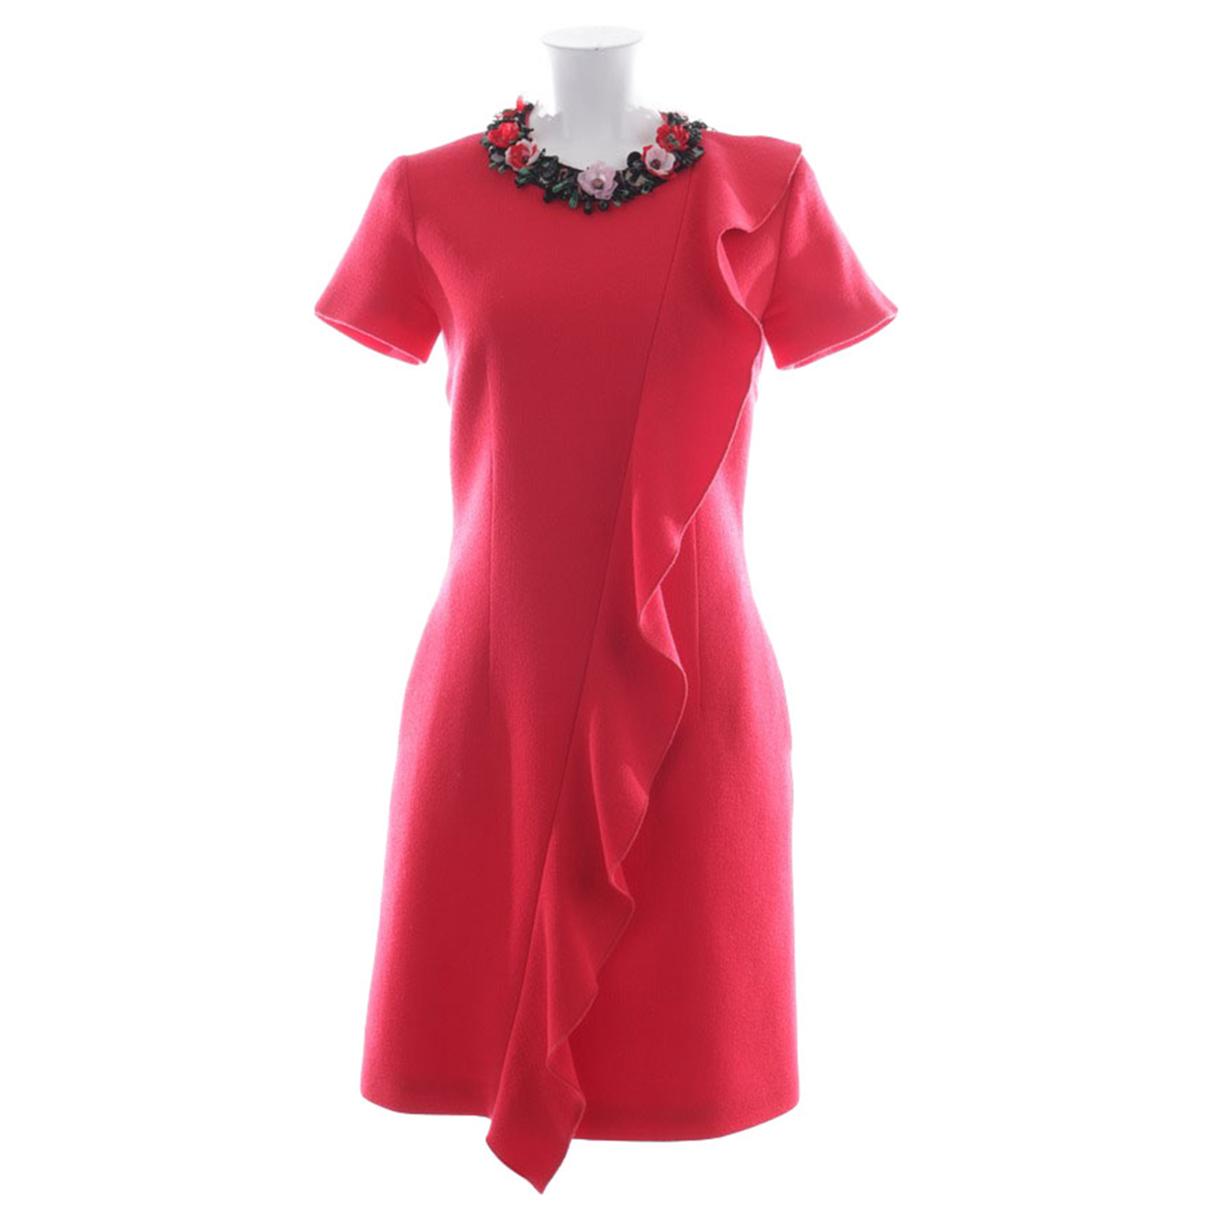 Msgm \N Red Wool dress for Women 34 FR